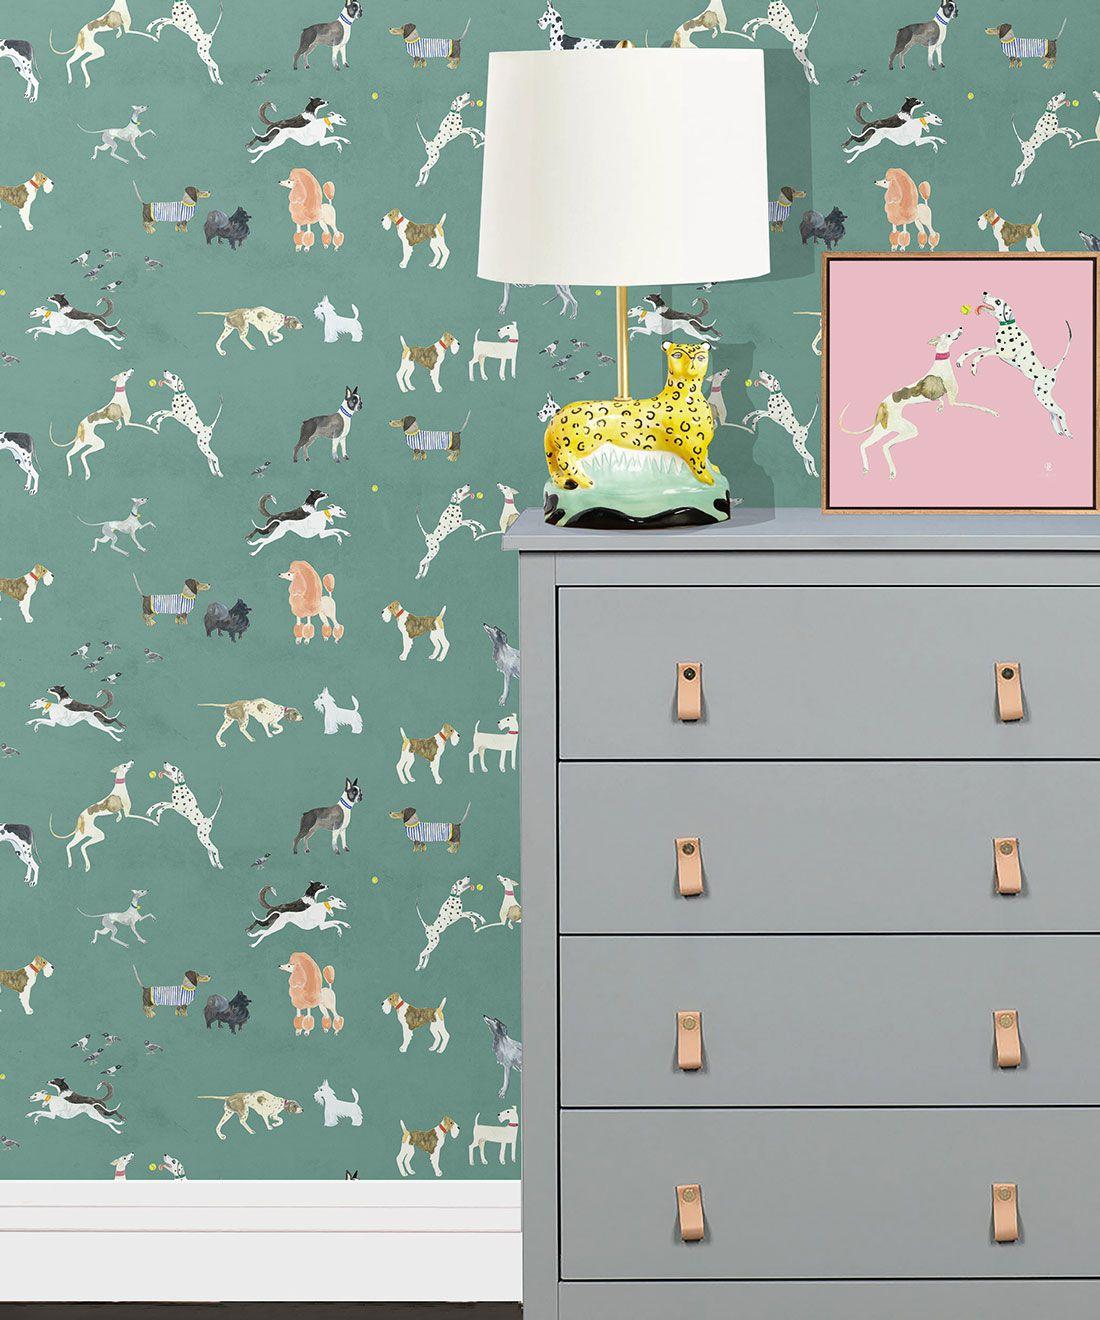 Doggies Wallpaper •Dog Wallpaper •Turquoise • Insitu with grey dresser